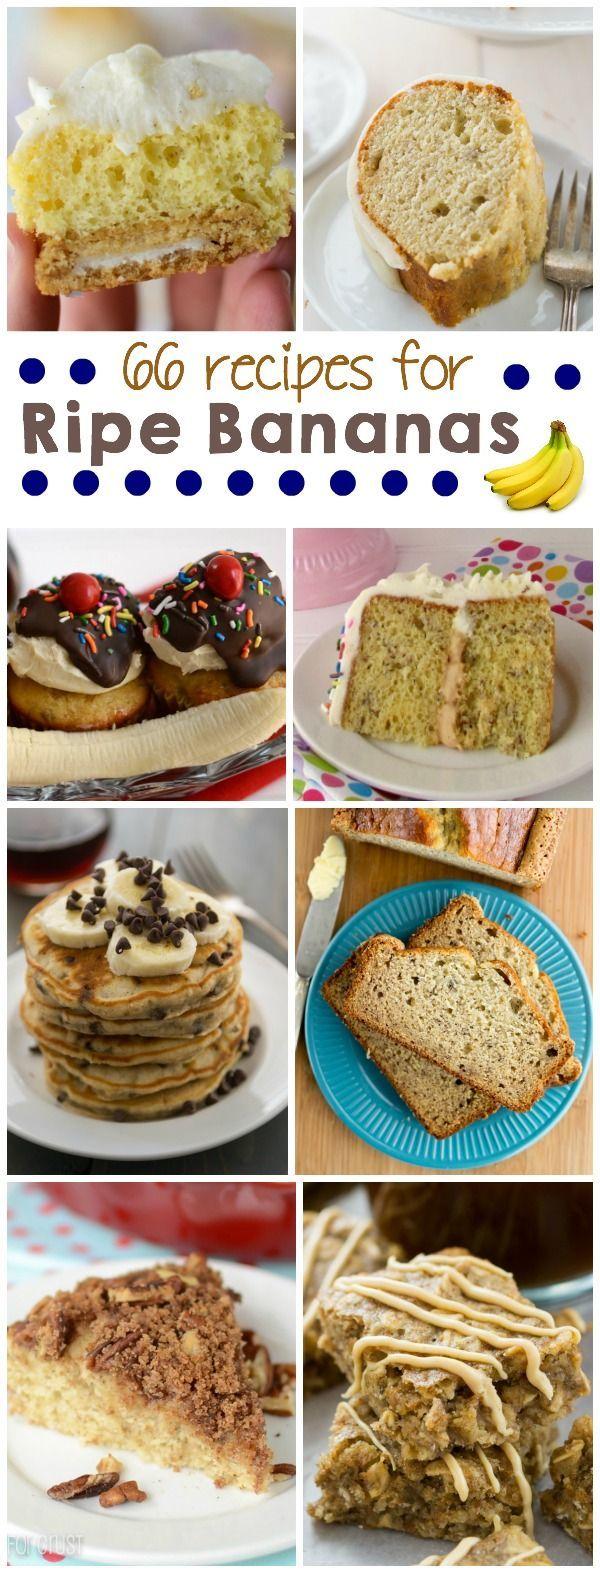 Over 66 Ways To Use Overripe Bananas Cookies Bread